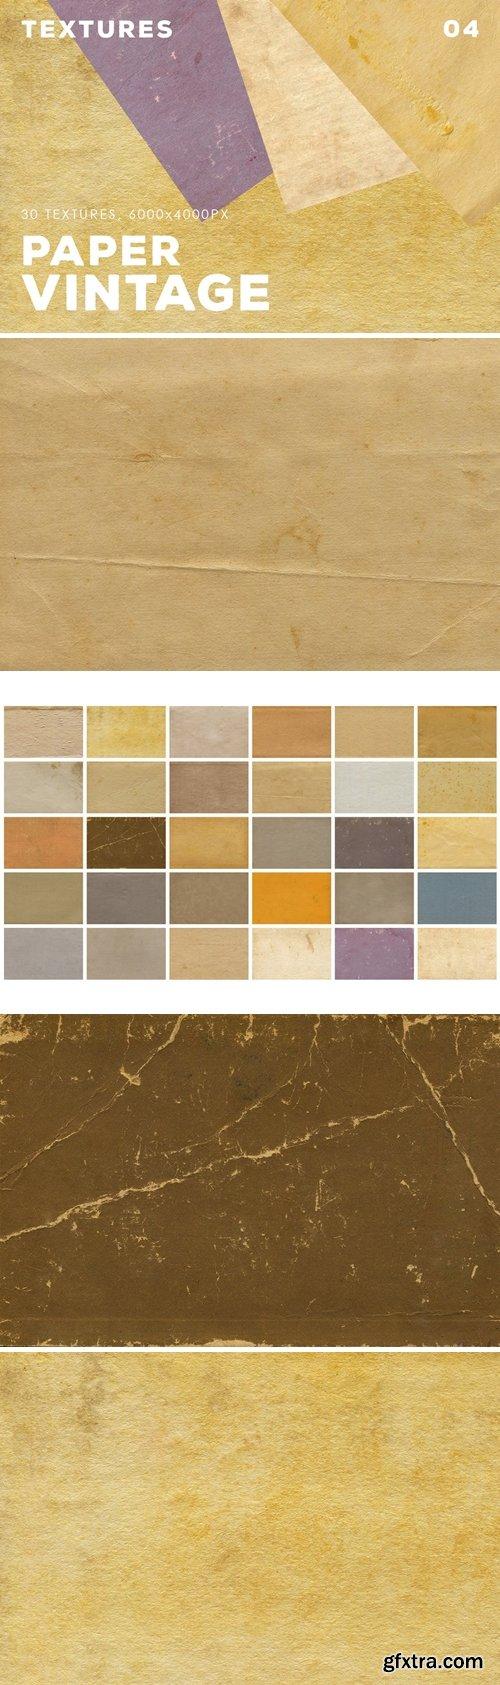 30 Vintage Paper Textures | 04